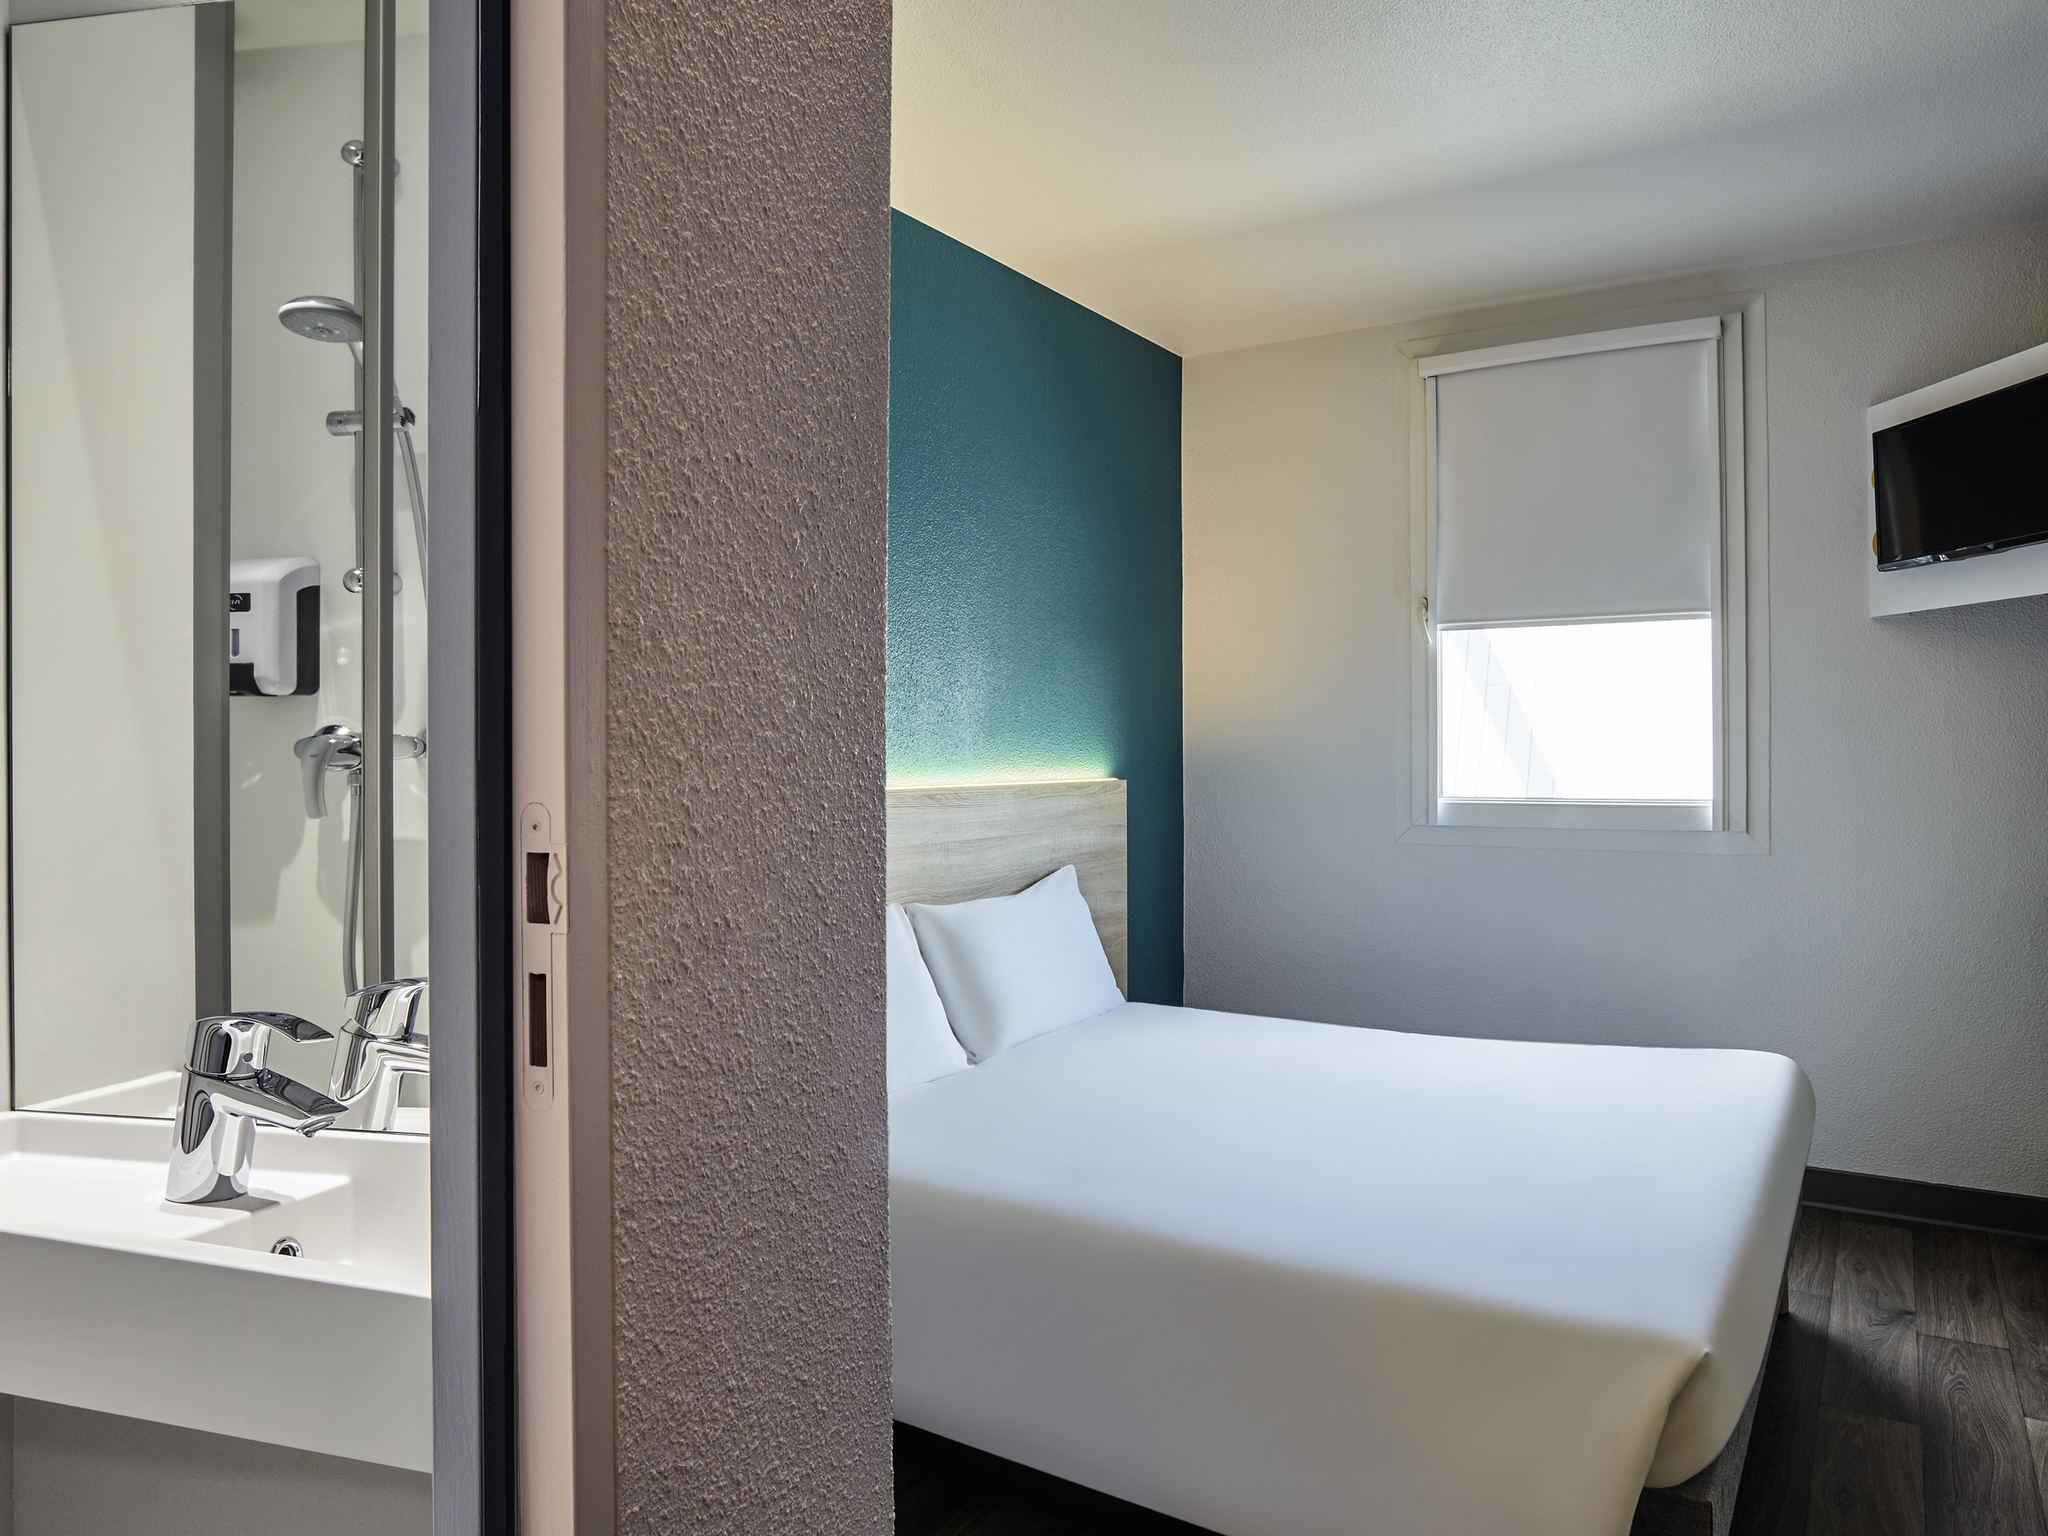 Hotel - hotelF1 Strasbourg Pont de l'Europe